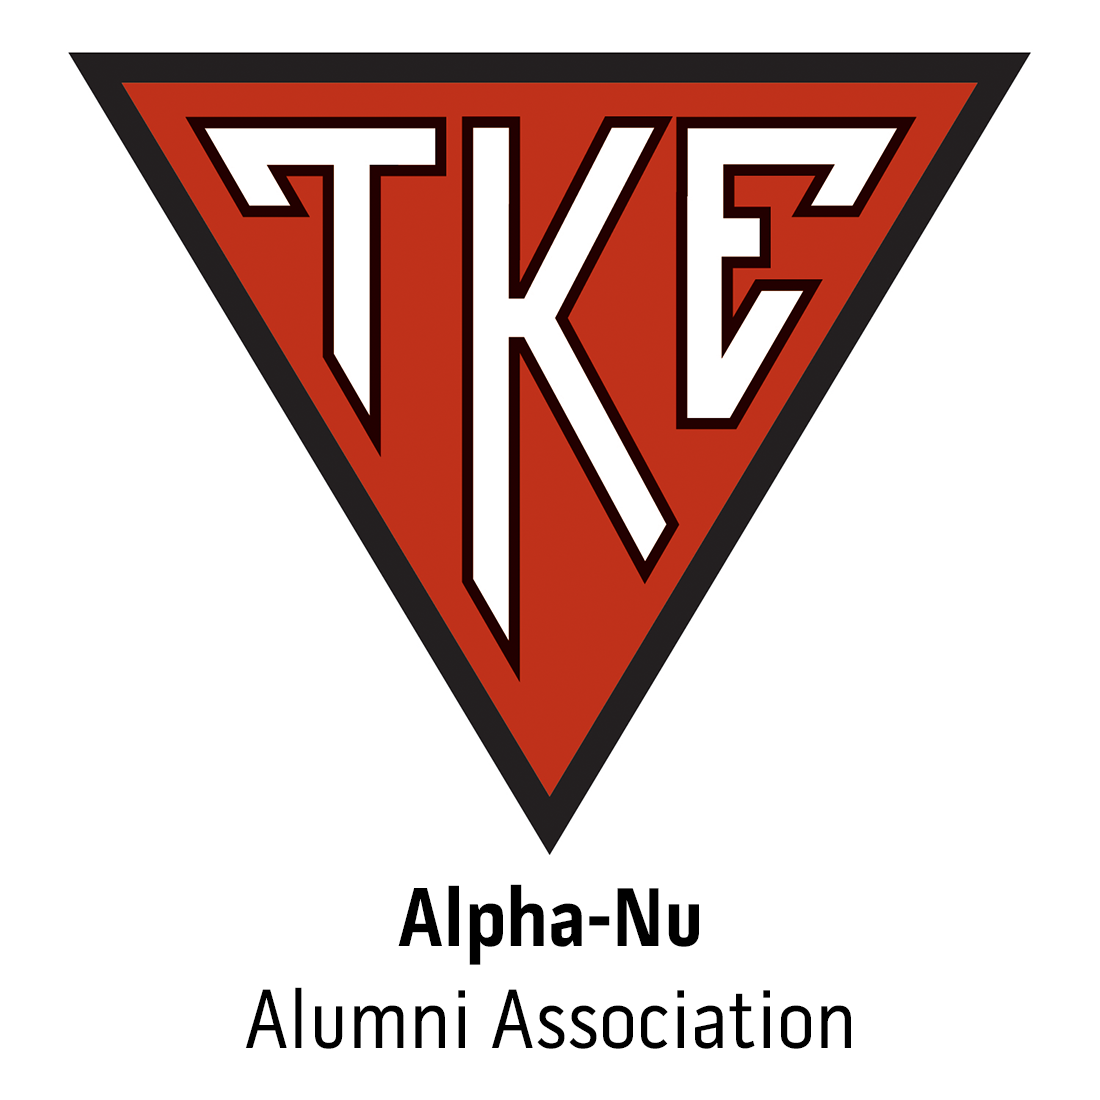 Alpha-Nu Alumni Association at University of New Hampshire